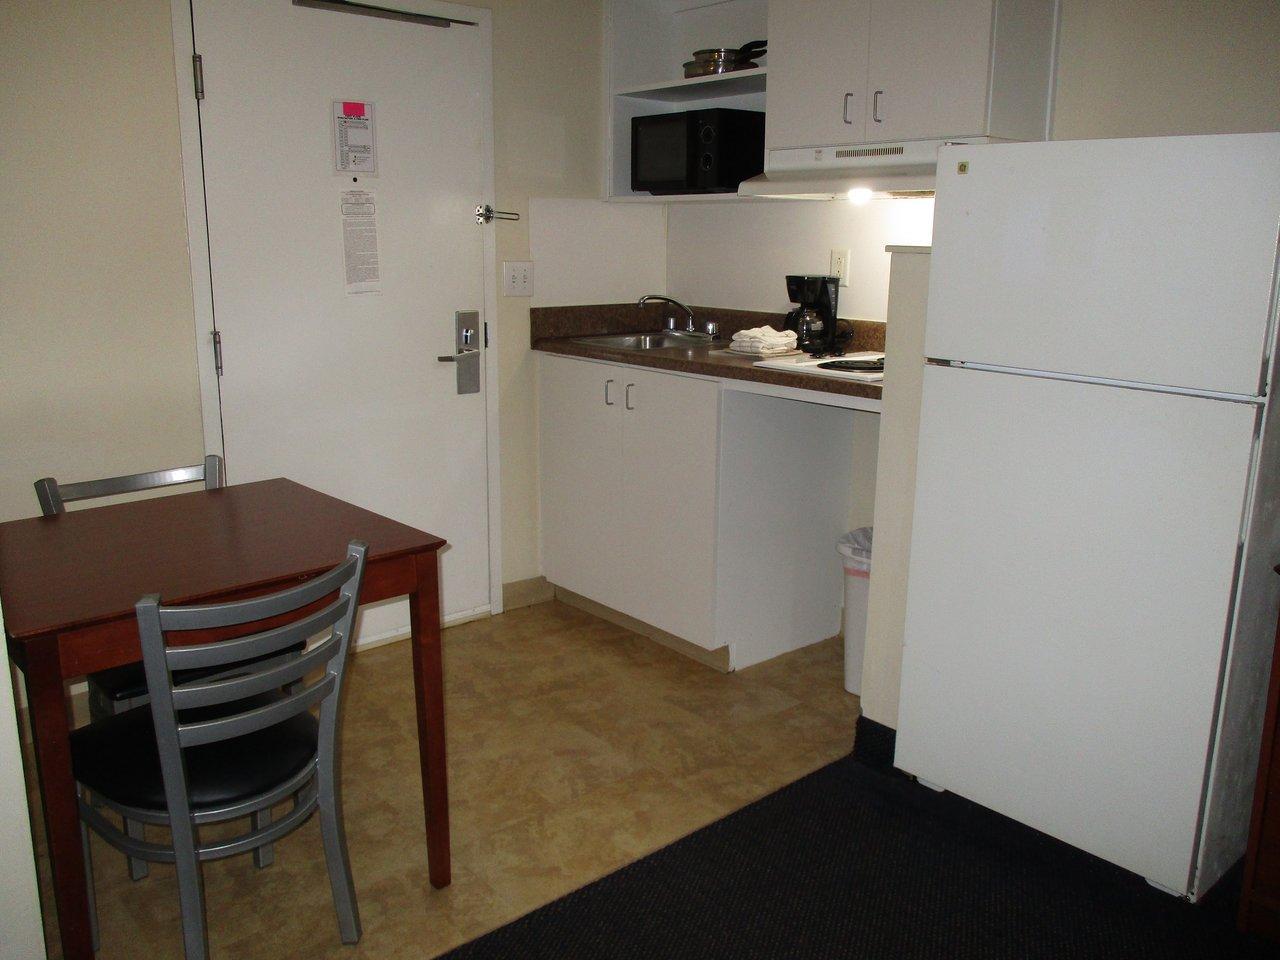 Motel 6 richmond va i 64 west 60 ̶7̶0̶ updated 2019 prices hotel reviews tripadvisor